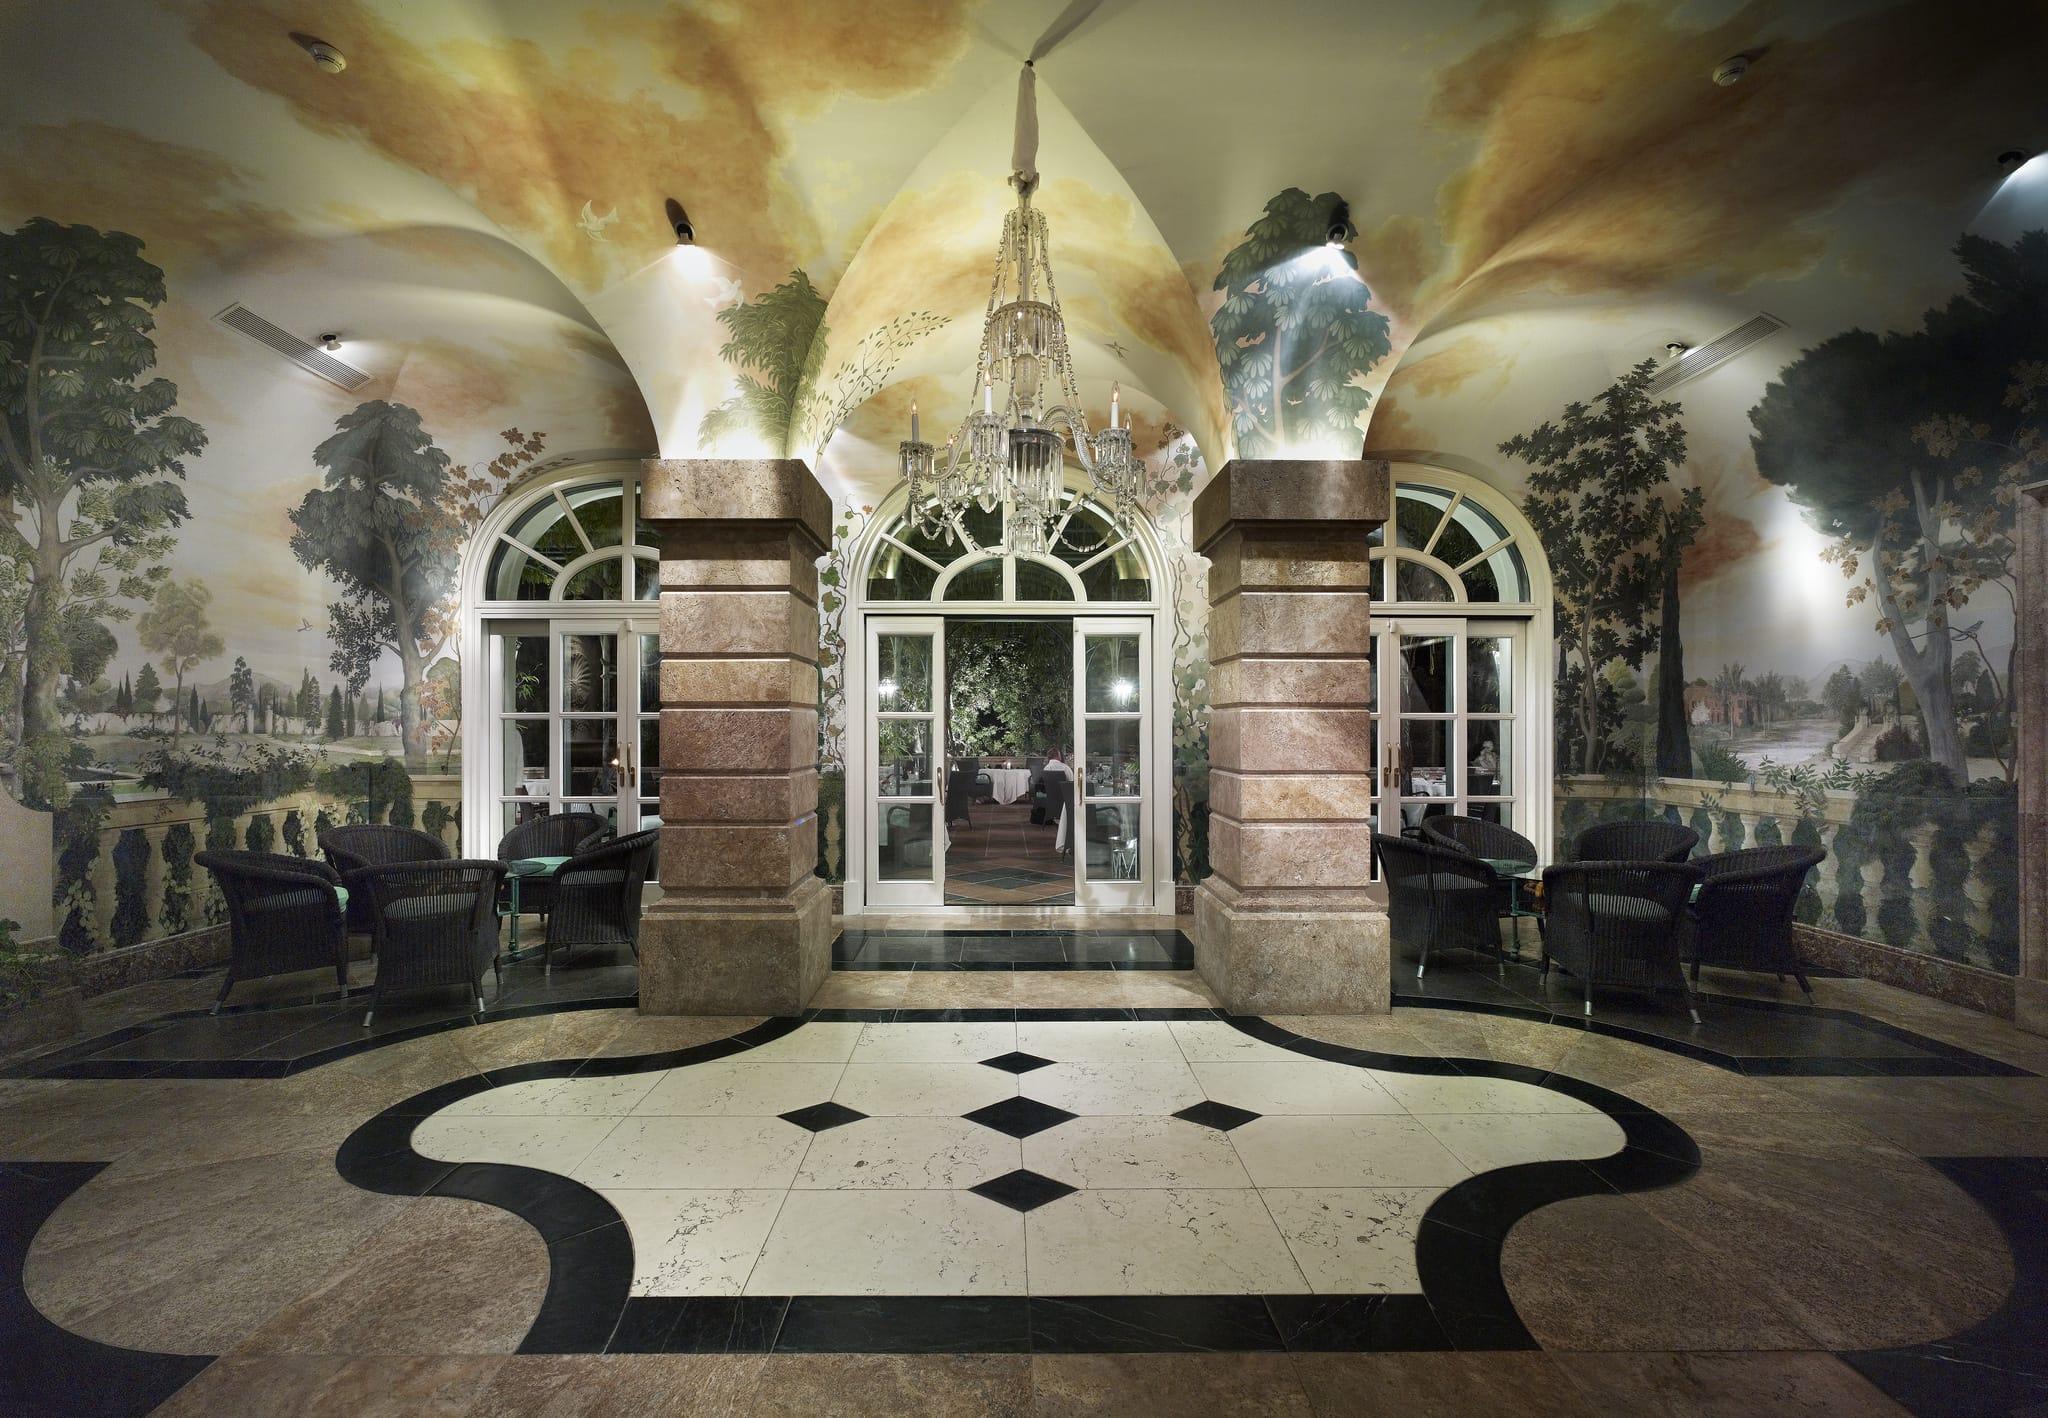 Mosaicos de mármol - Salones Villa Padierna Palace hotel - Marble mosaics